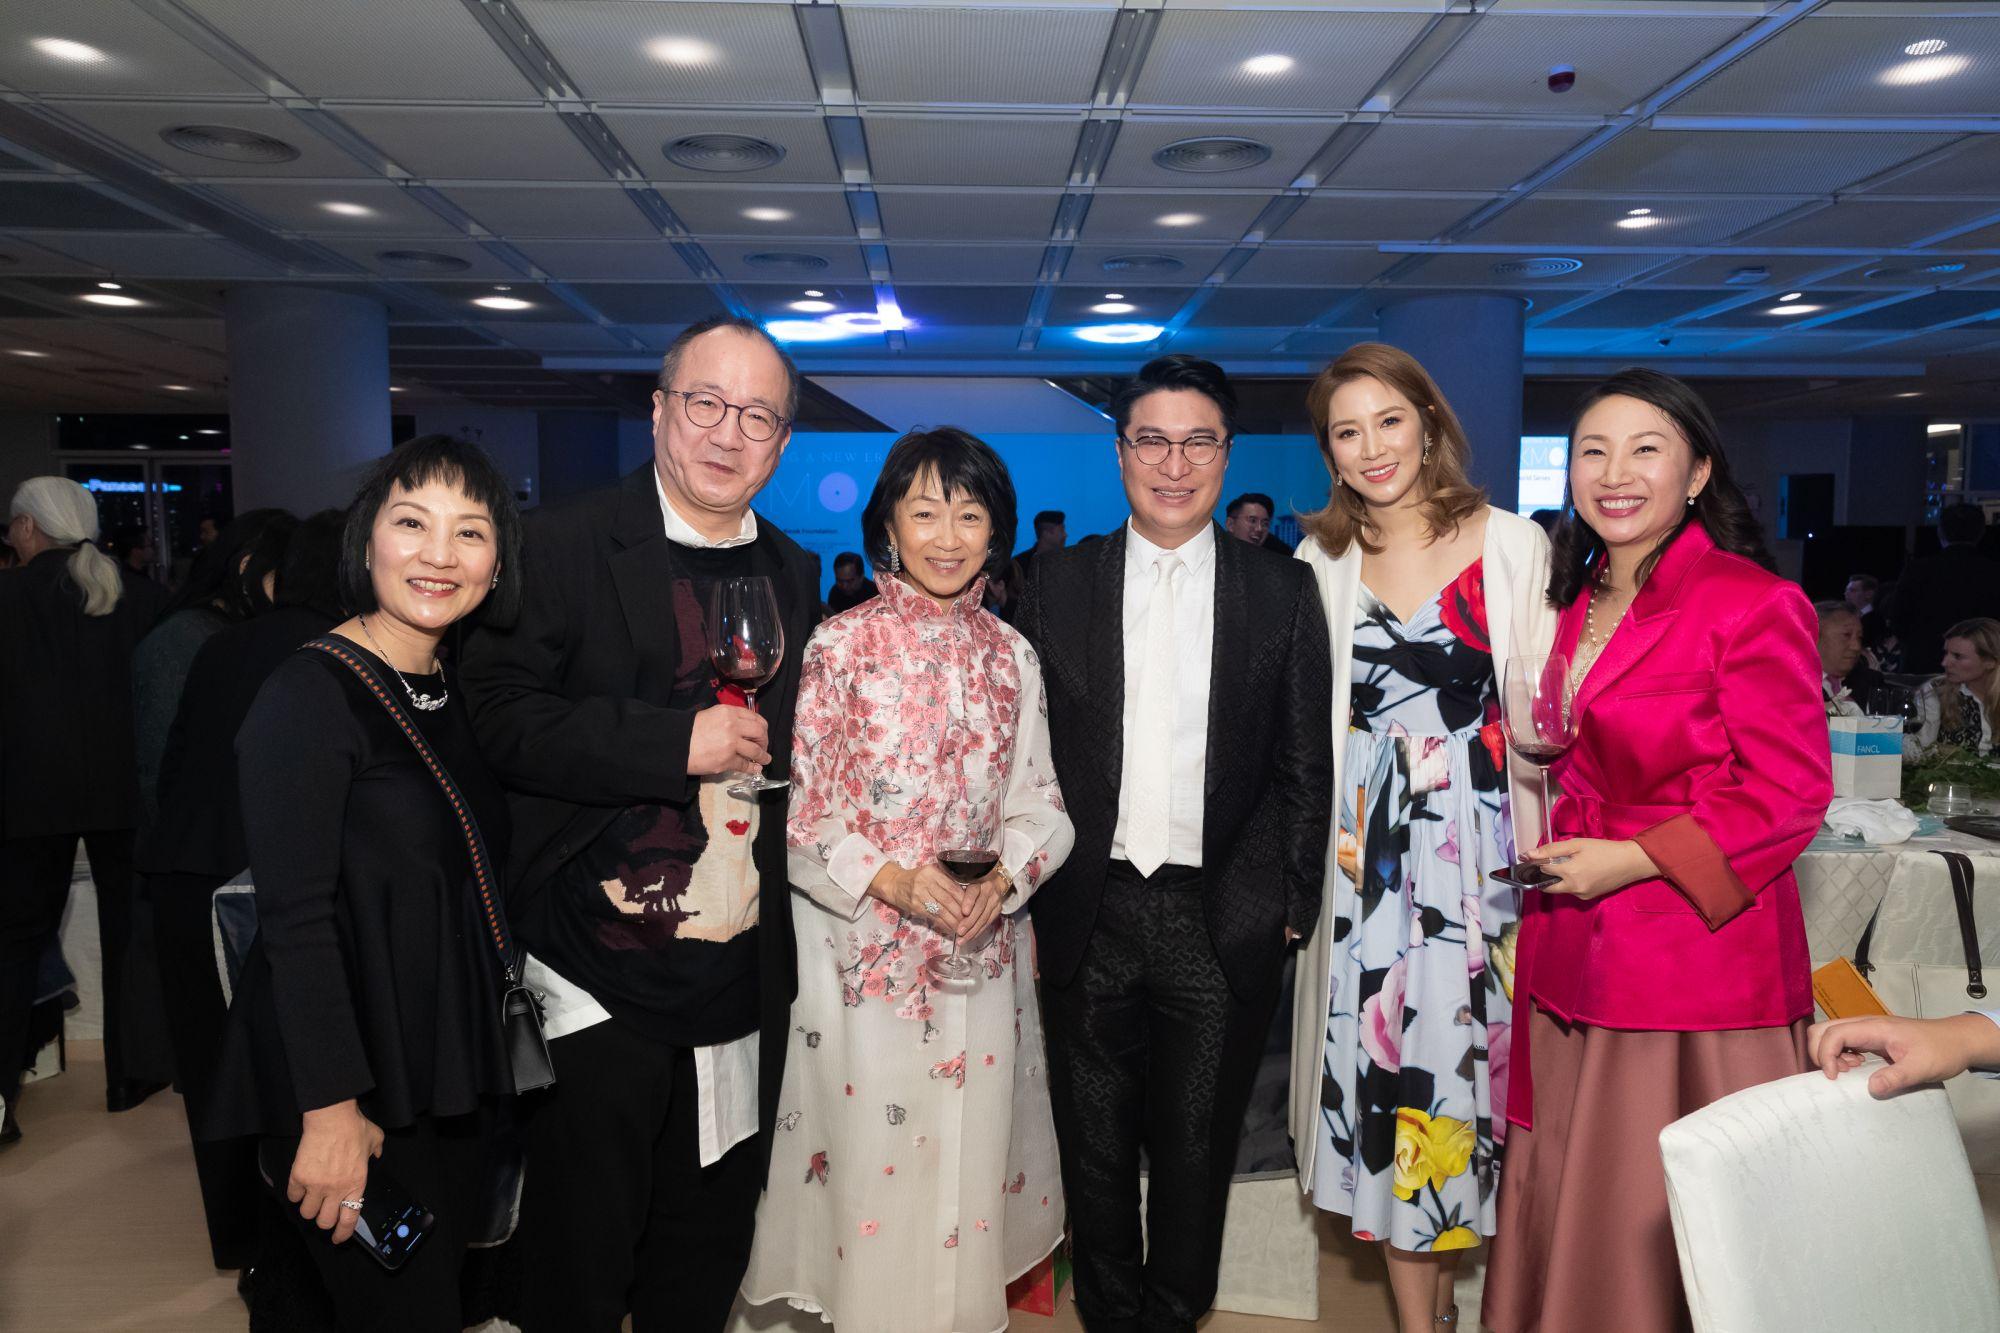 Mr. Stephen Suen and his wife, Nancy Lee, Martin Lee, Cathy Lee, Elaine Kwok